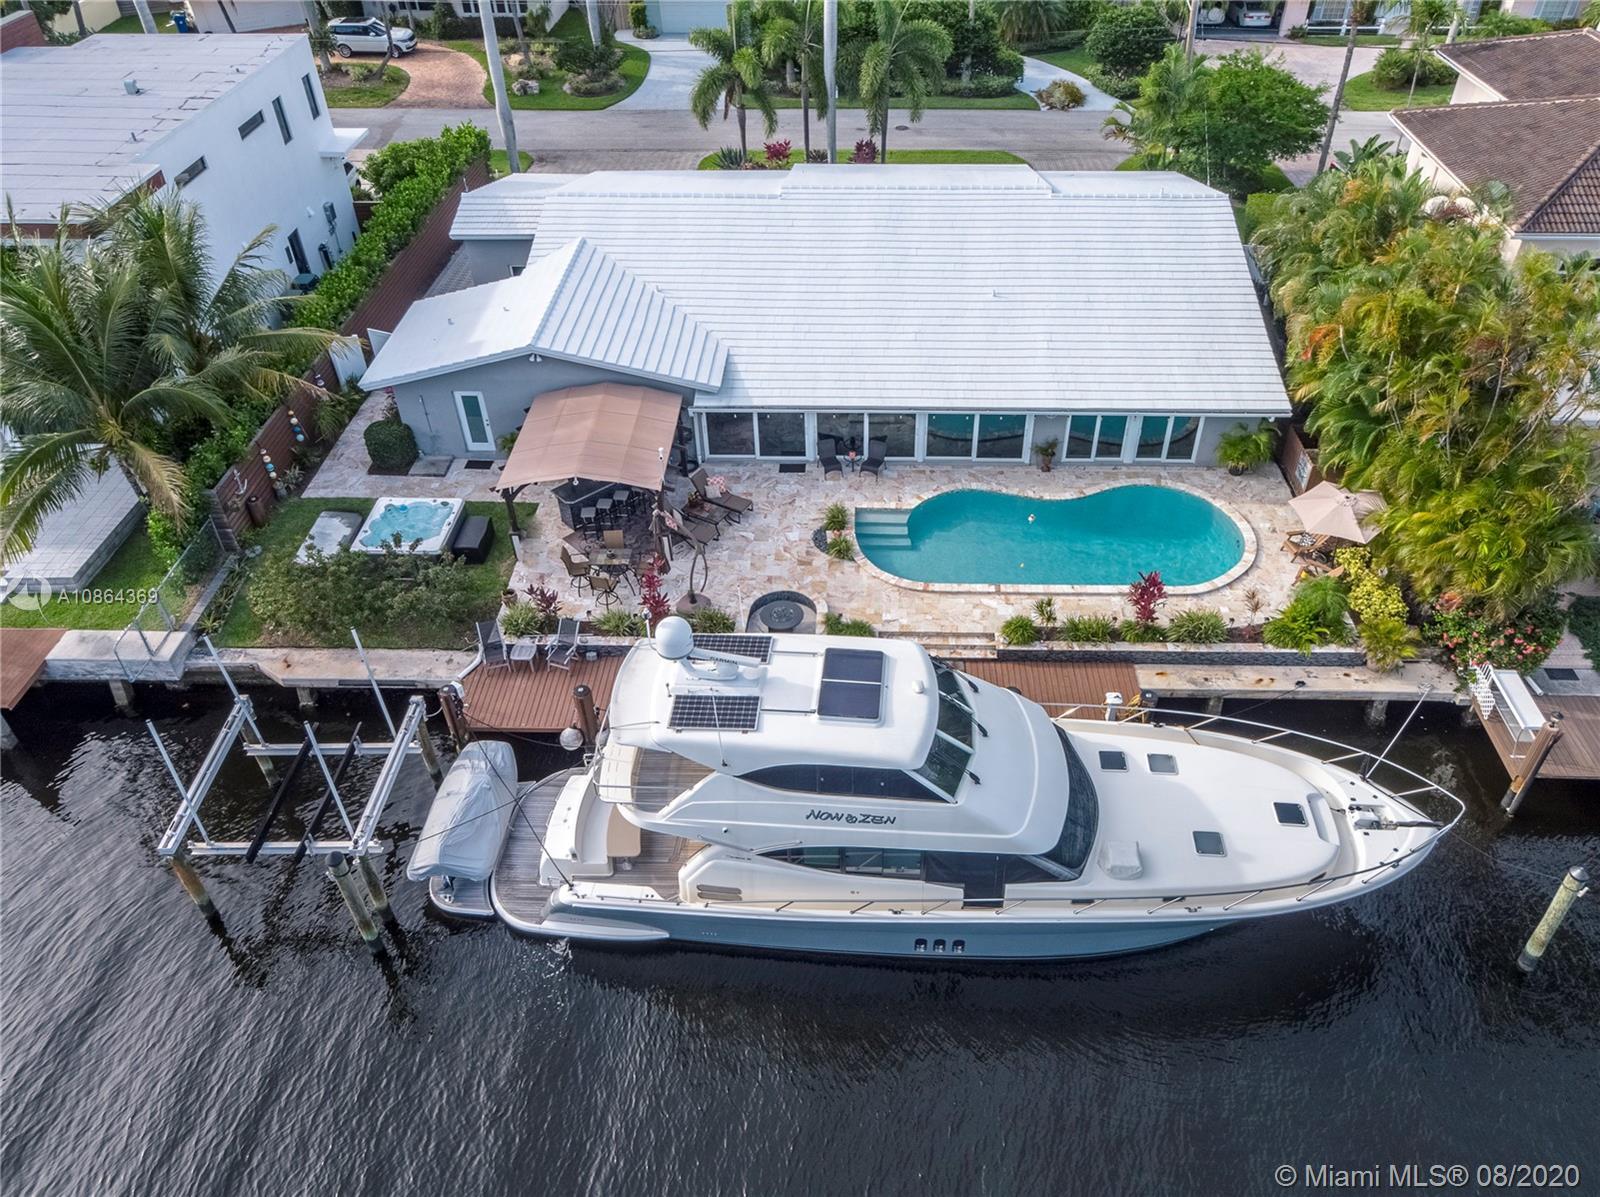 2824 NE 25th St Fort Lauderdale, FL  33305